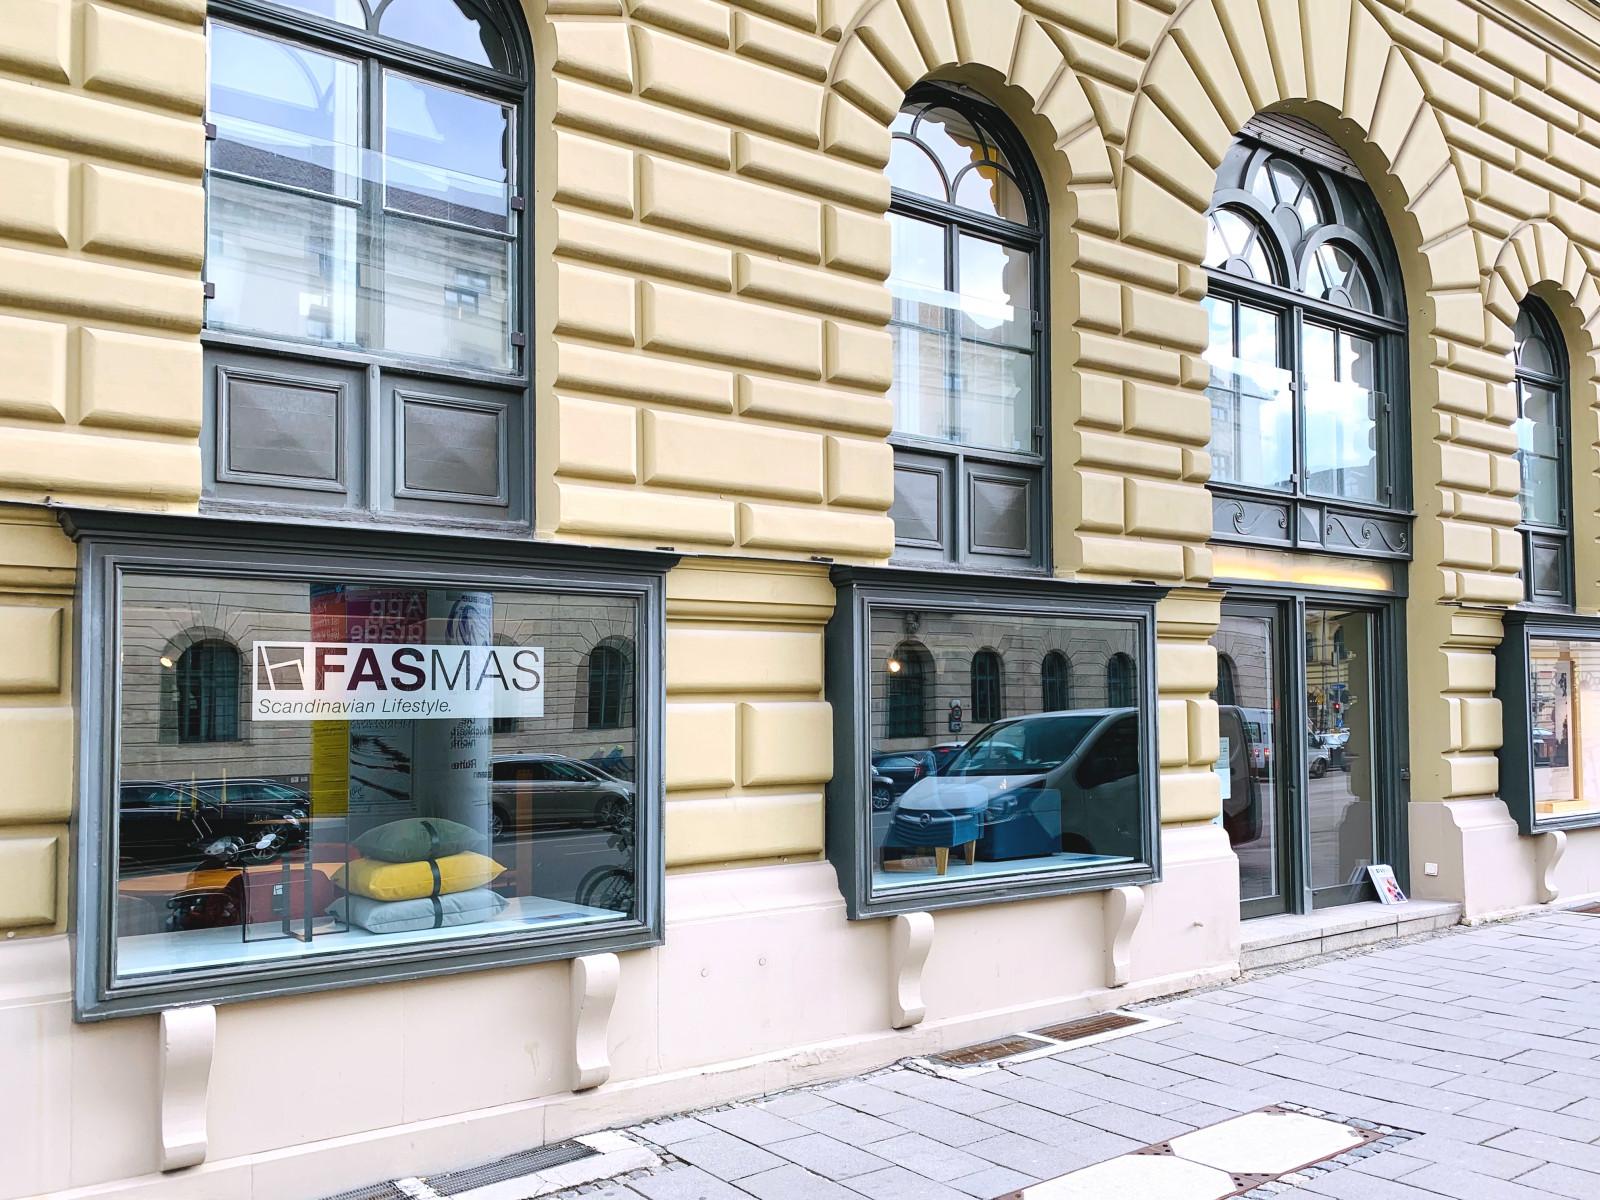 FASMAS-Showroom im Ludwigpalais in München